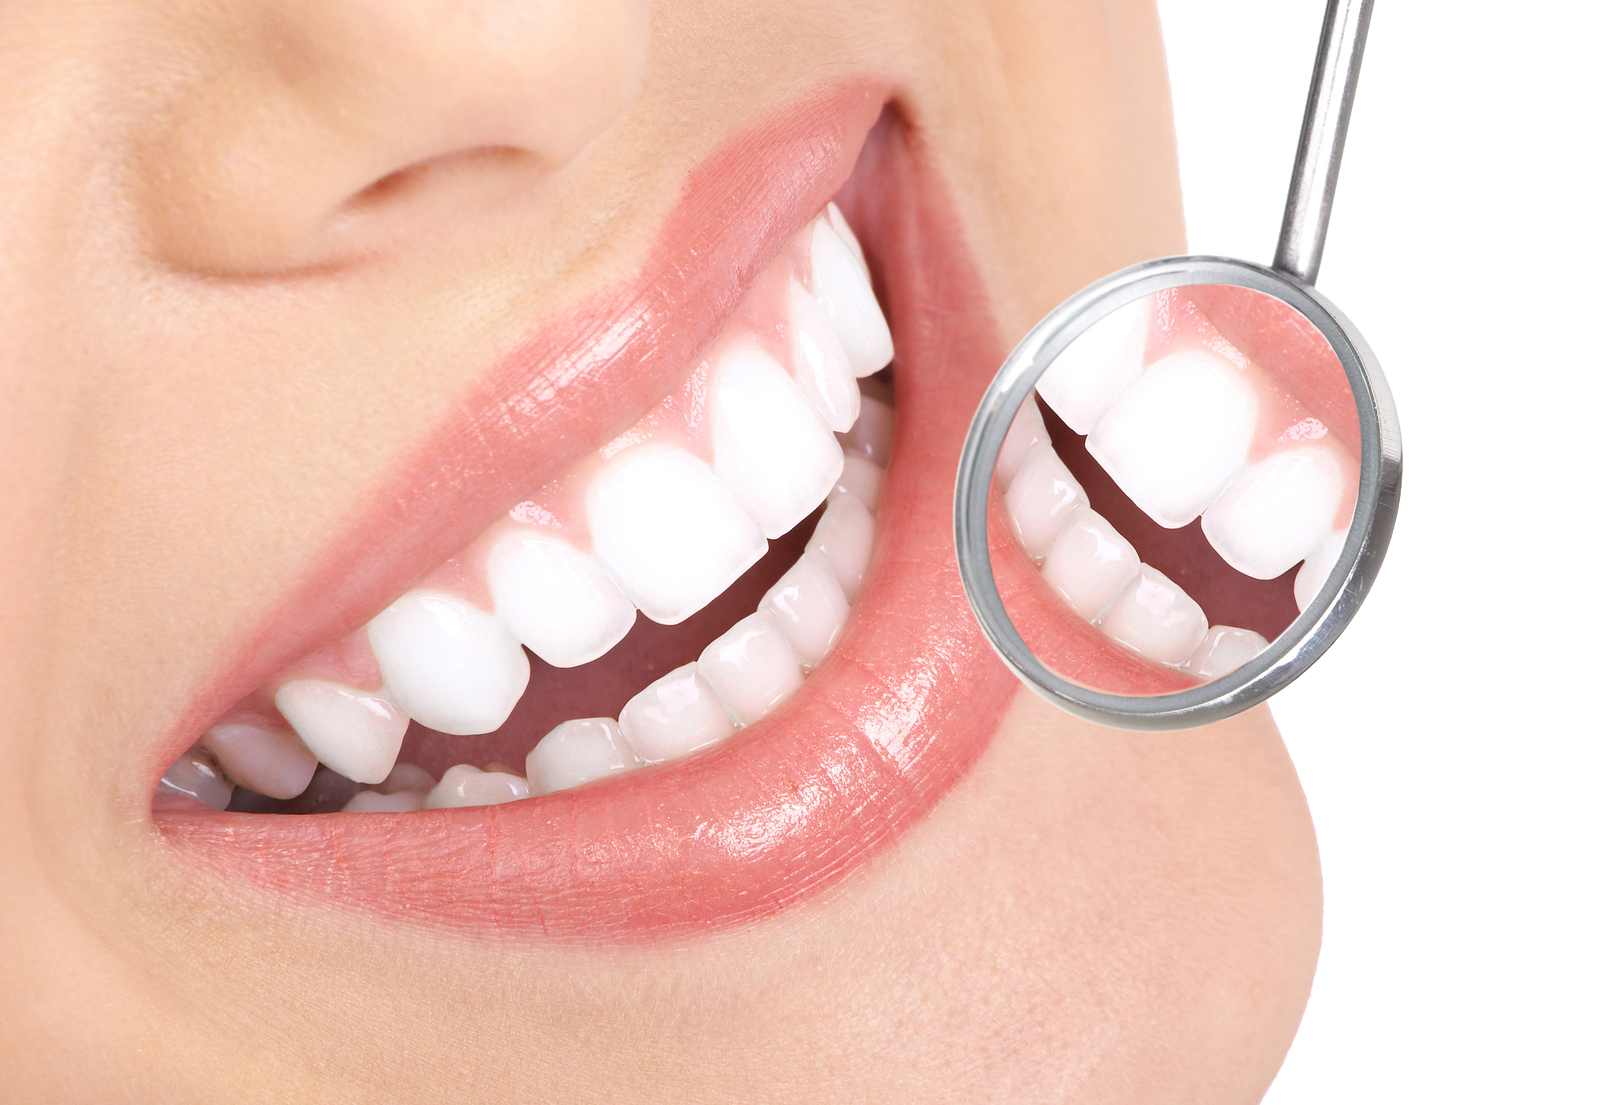 Teeth Smile PNG HD Transparent Teeth Smile HD.PNG Images..